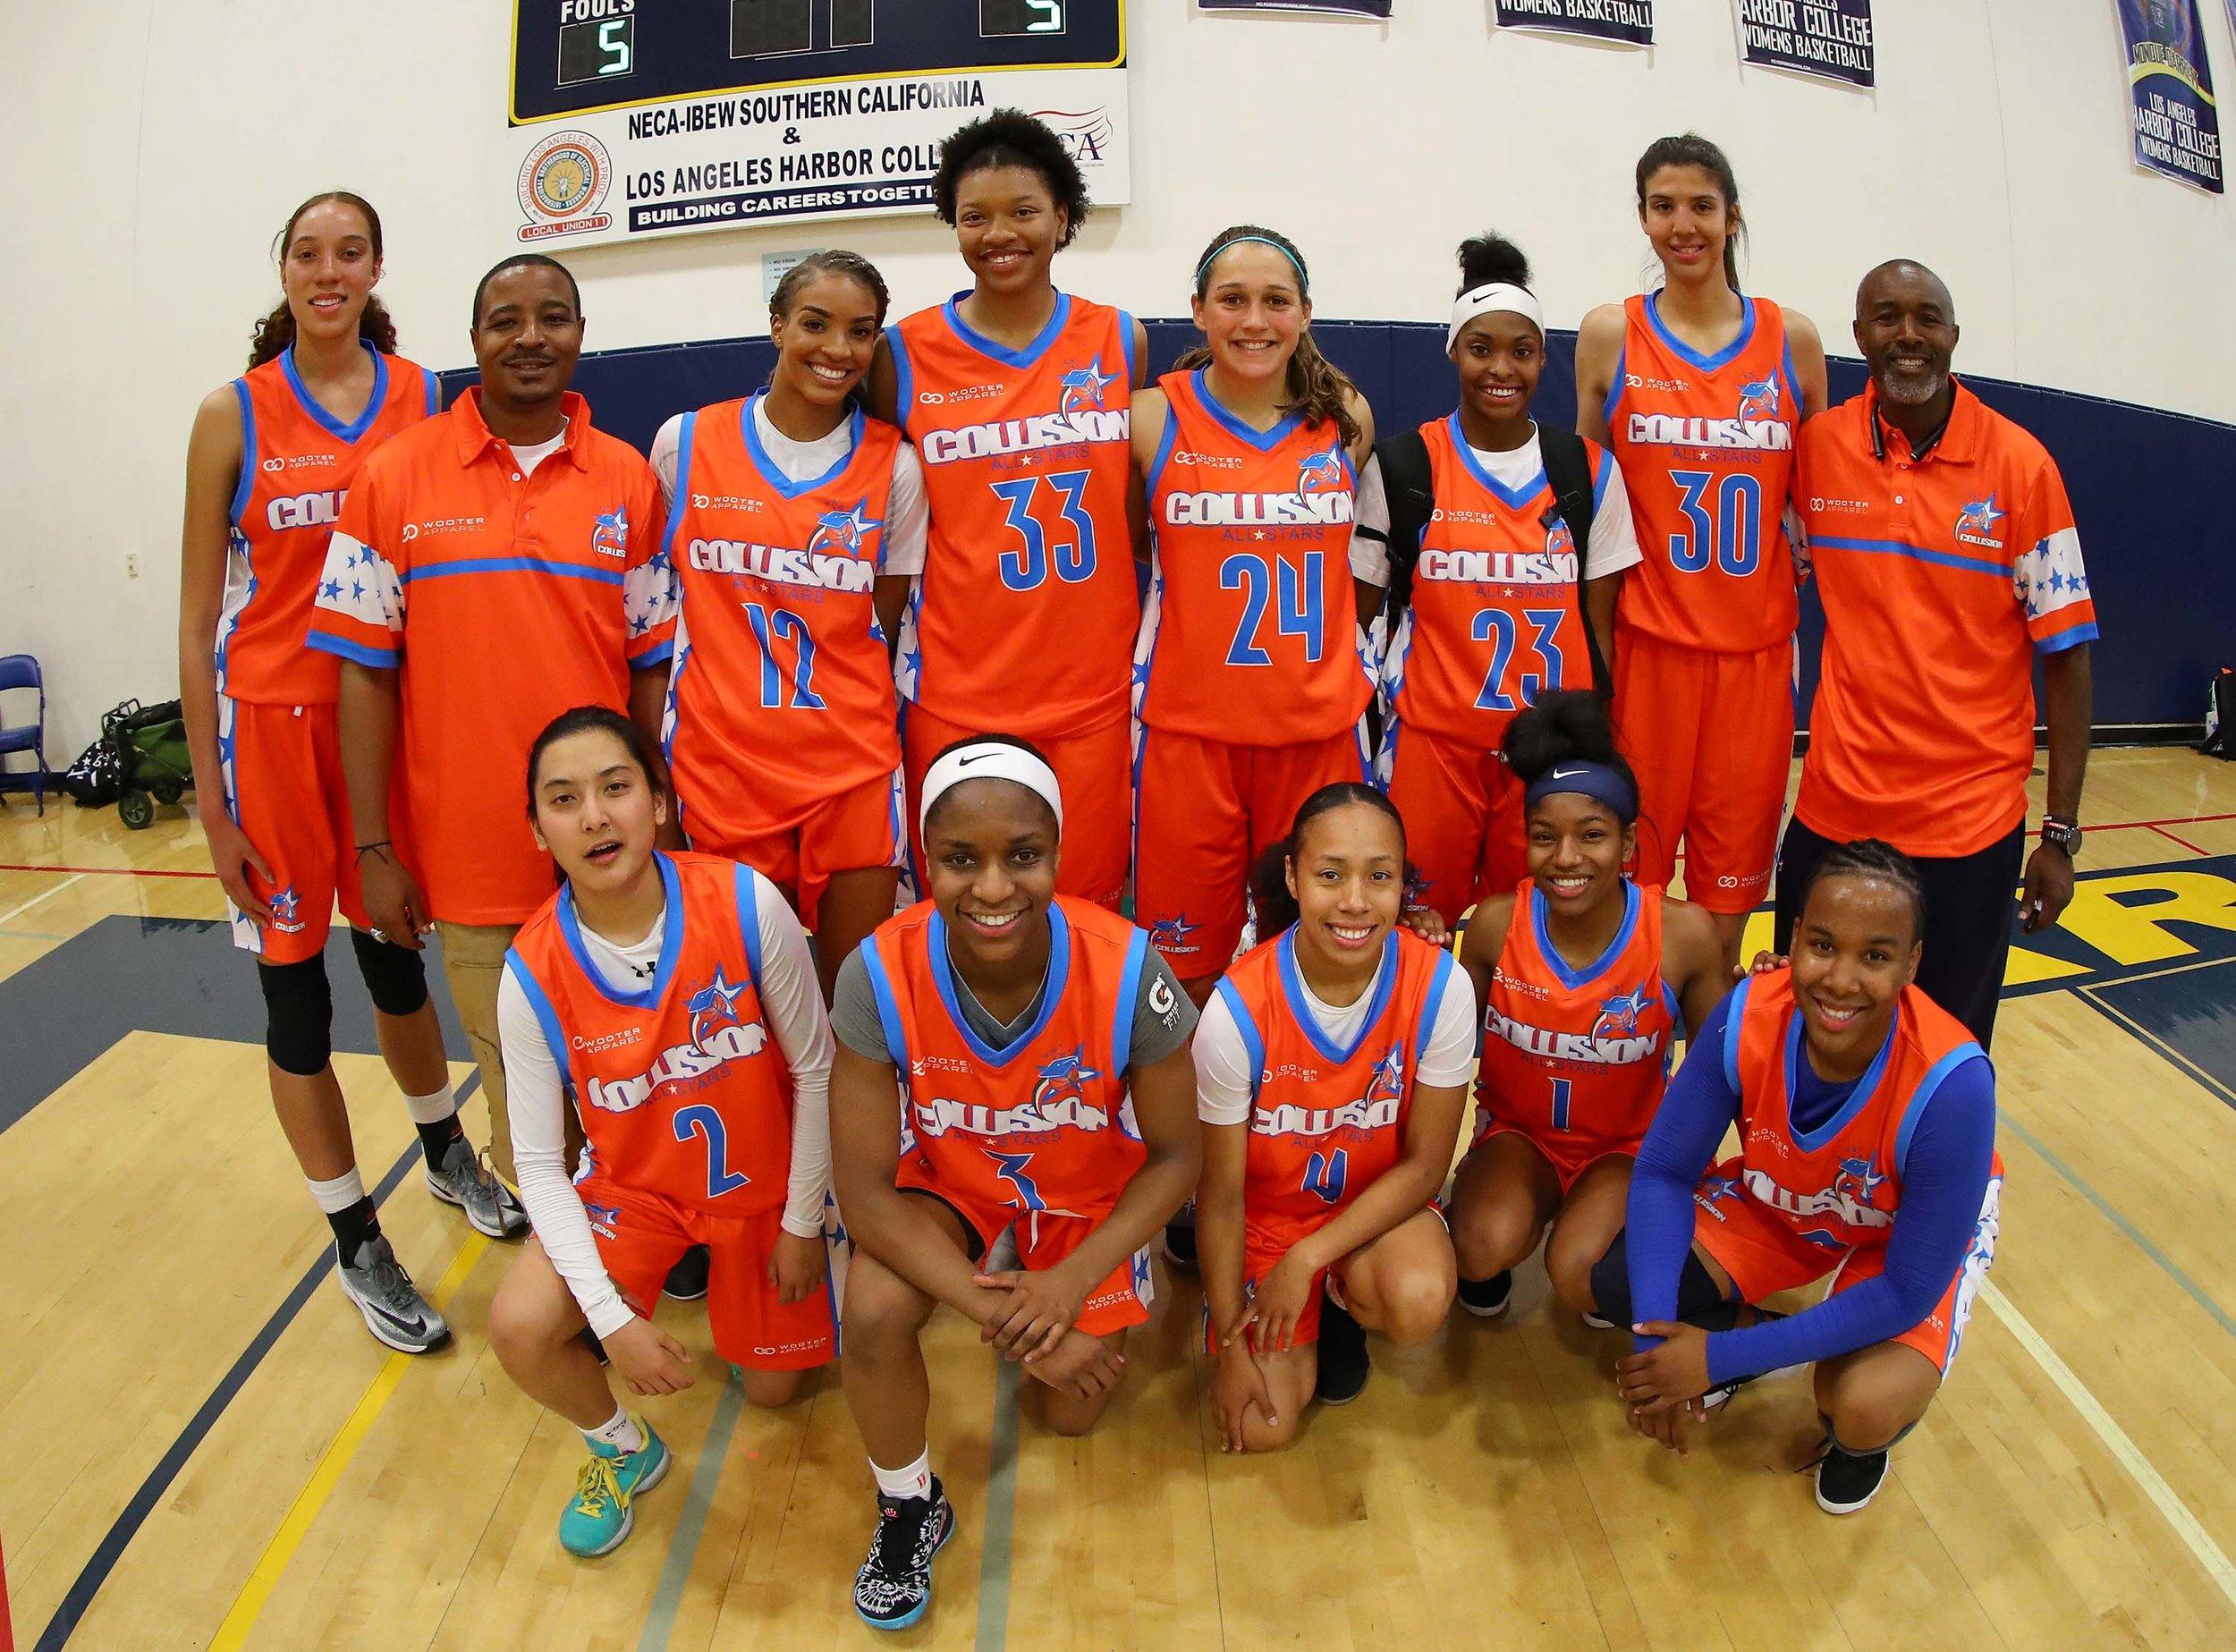 Women's COLLISION Orange Blue White basketball uniforms, jerseys and shorts